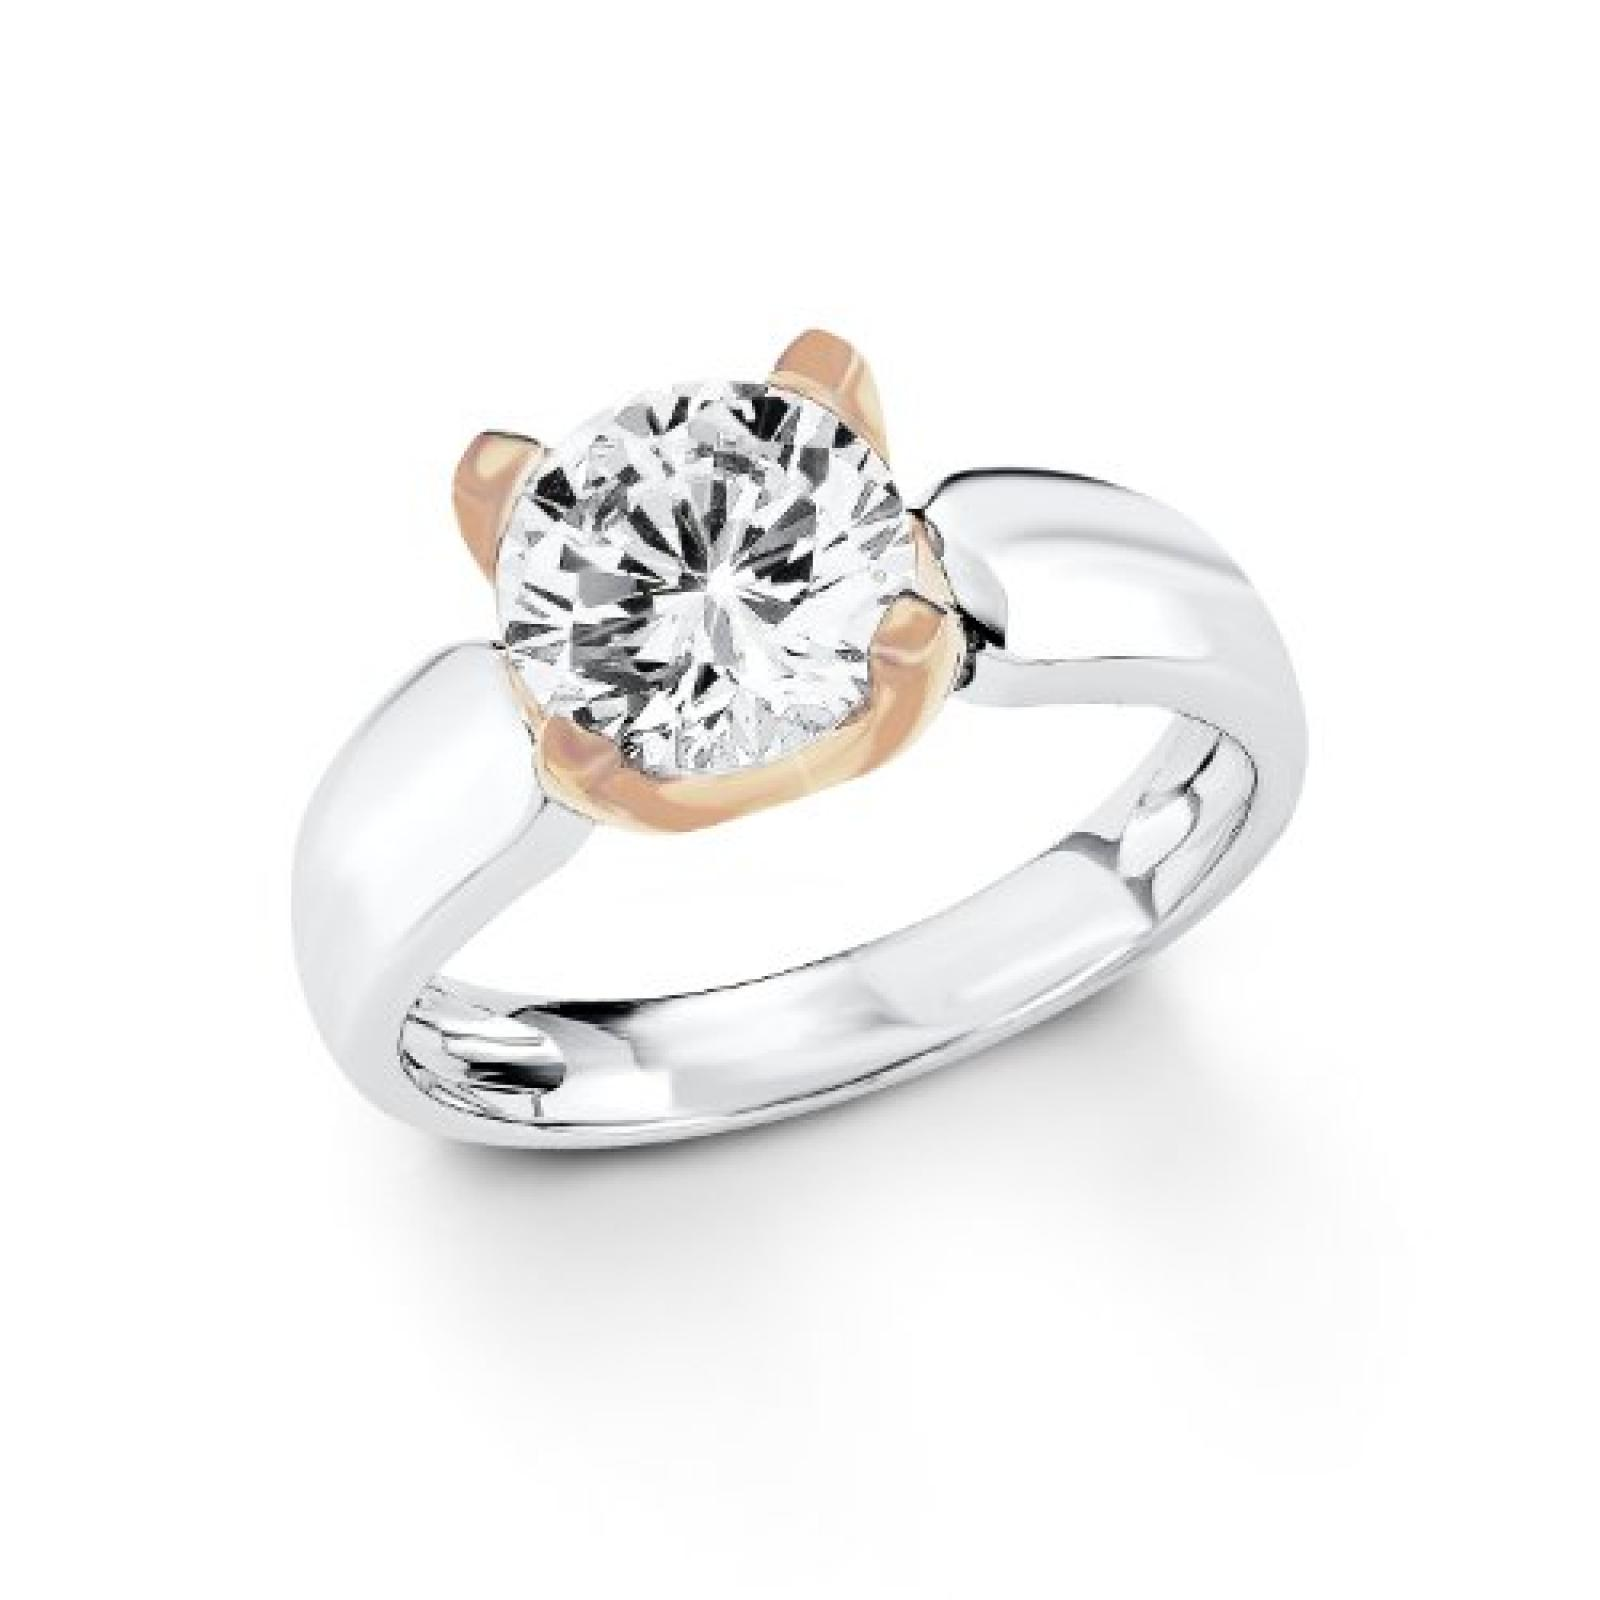 s.Oliver Jewel Damen-Ring 925 Sterling Silber Zirkonia weiß  4873